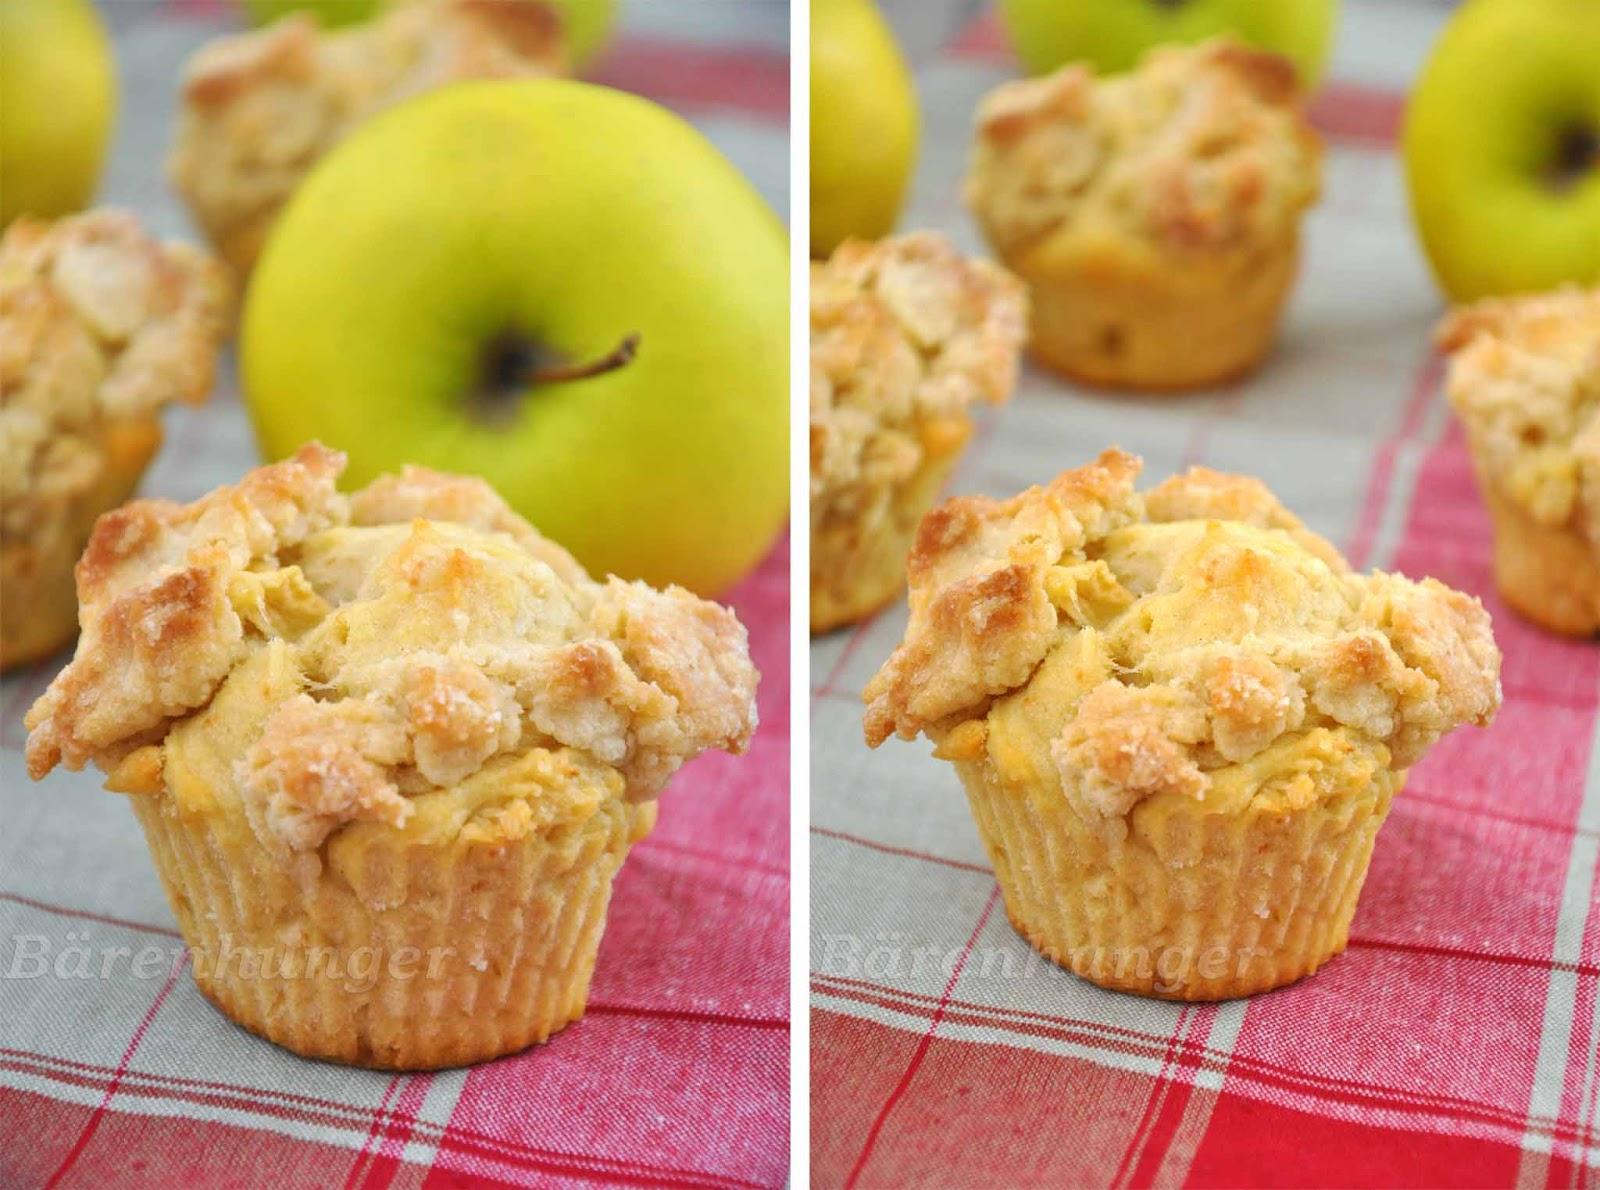 Apfel Streusel Muffins Barenhunger